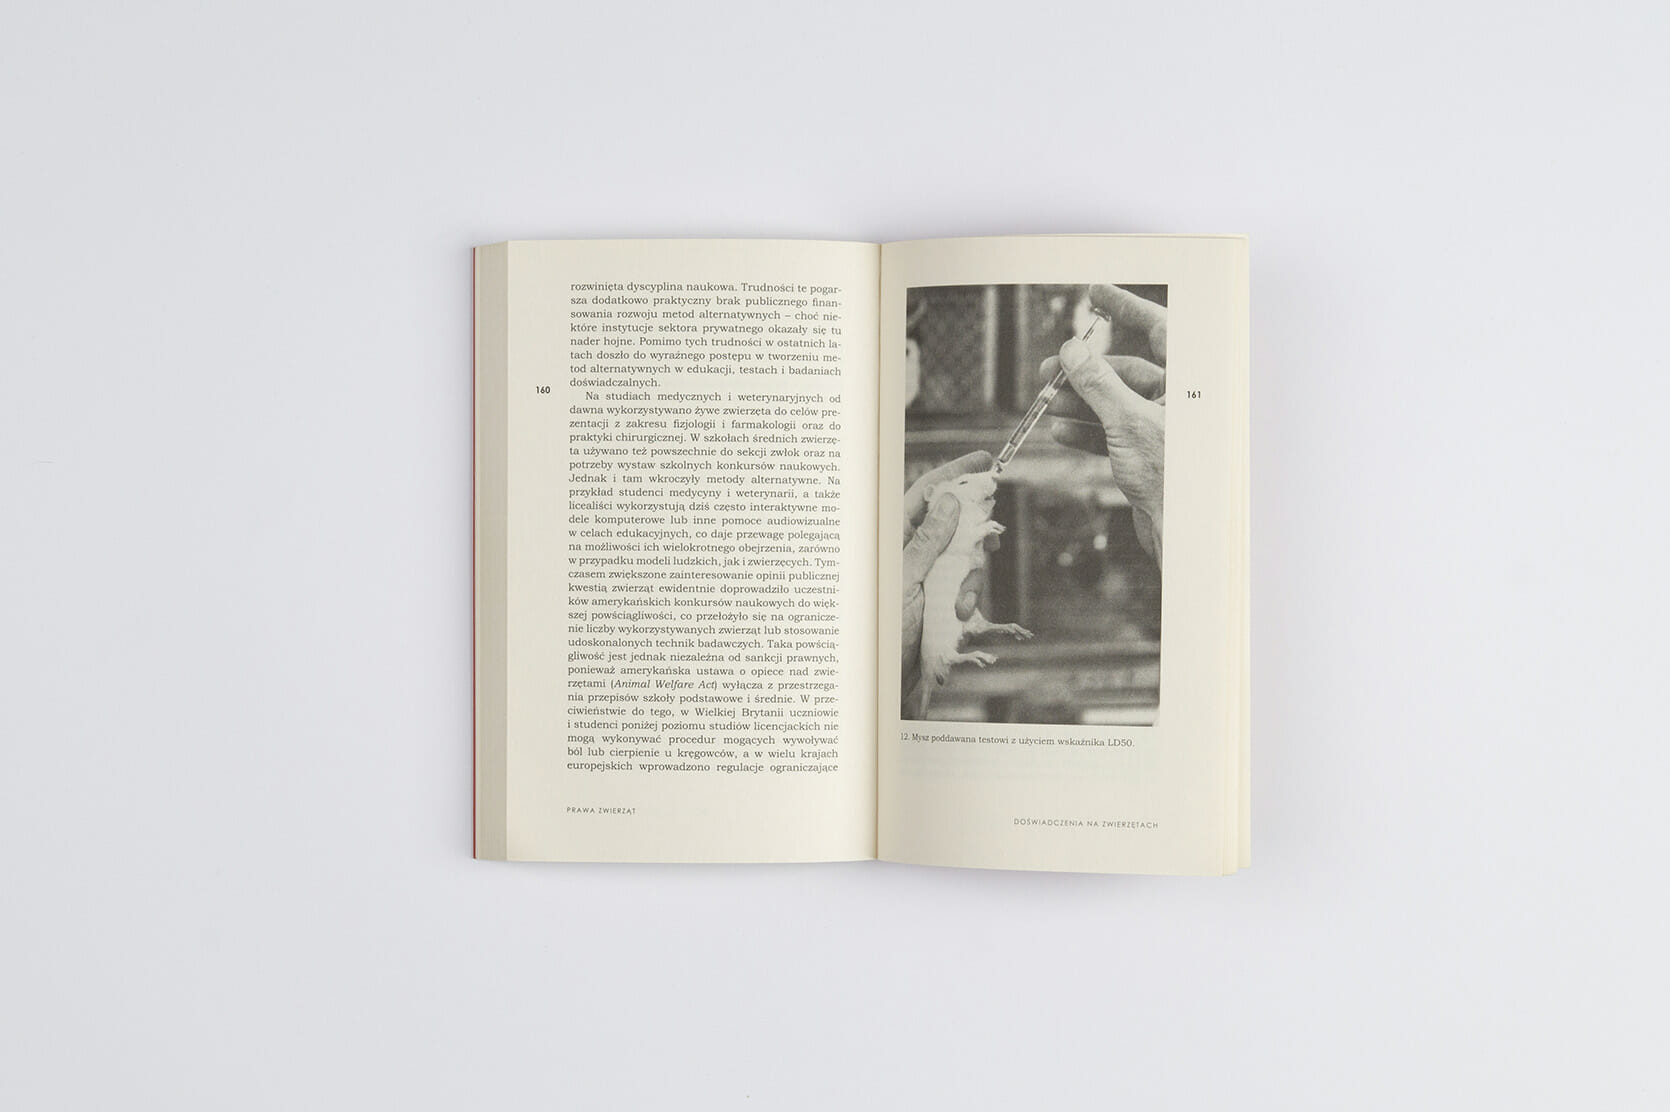 Animal rights - de grazia - book cover - typography